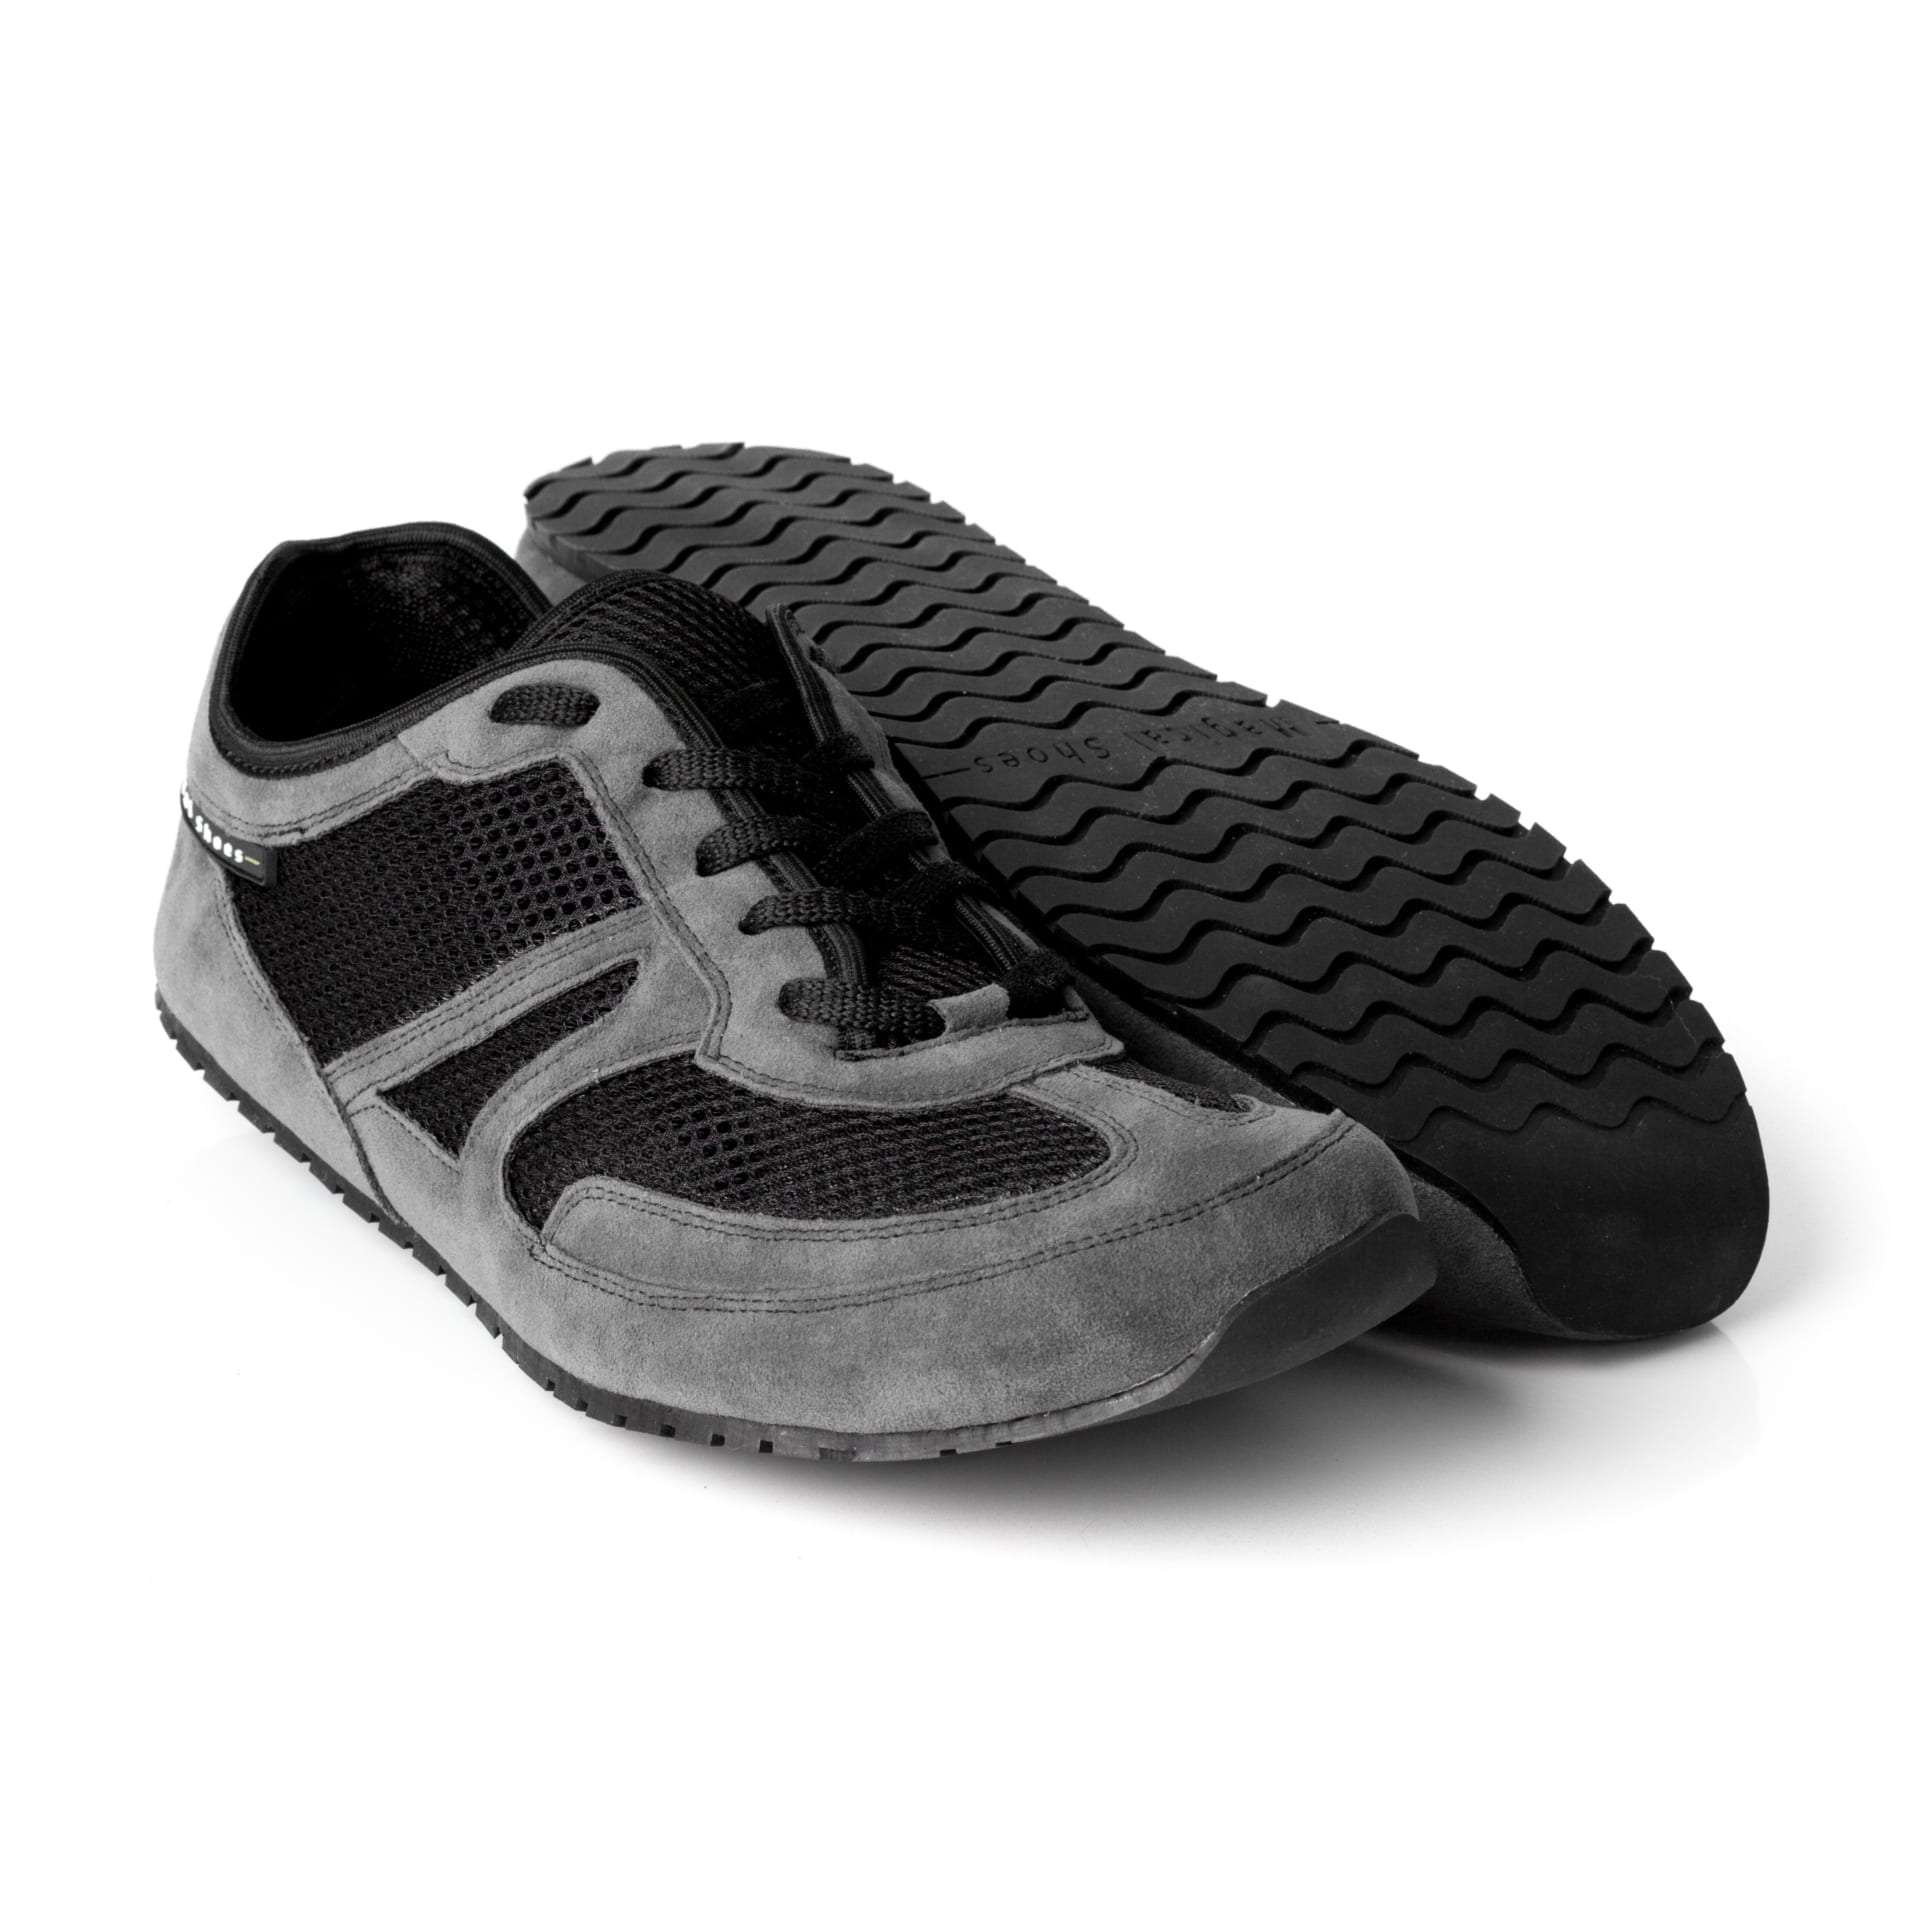 Magical Shoes BAREFOOT SHOES EXPLORER VEGAN GRAY KIDS picture 1